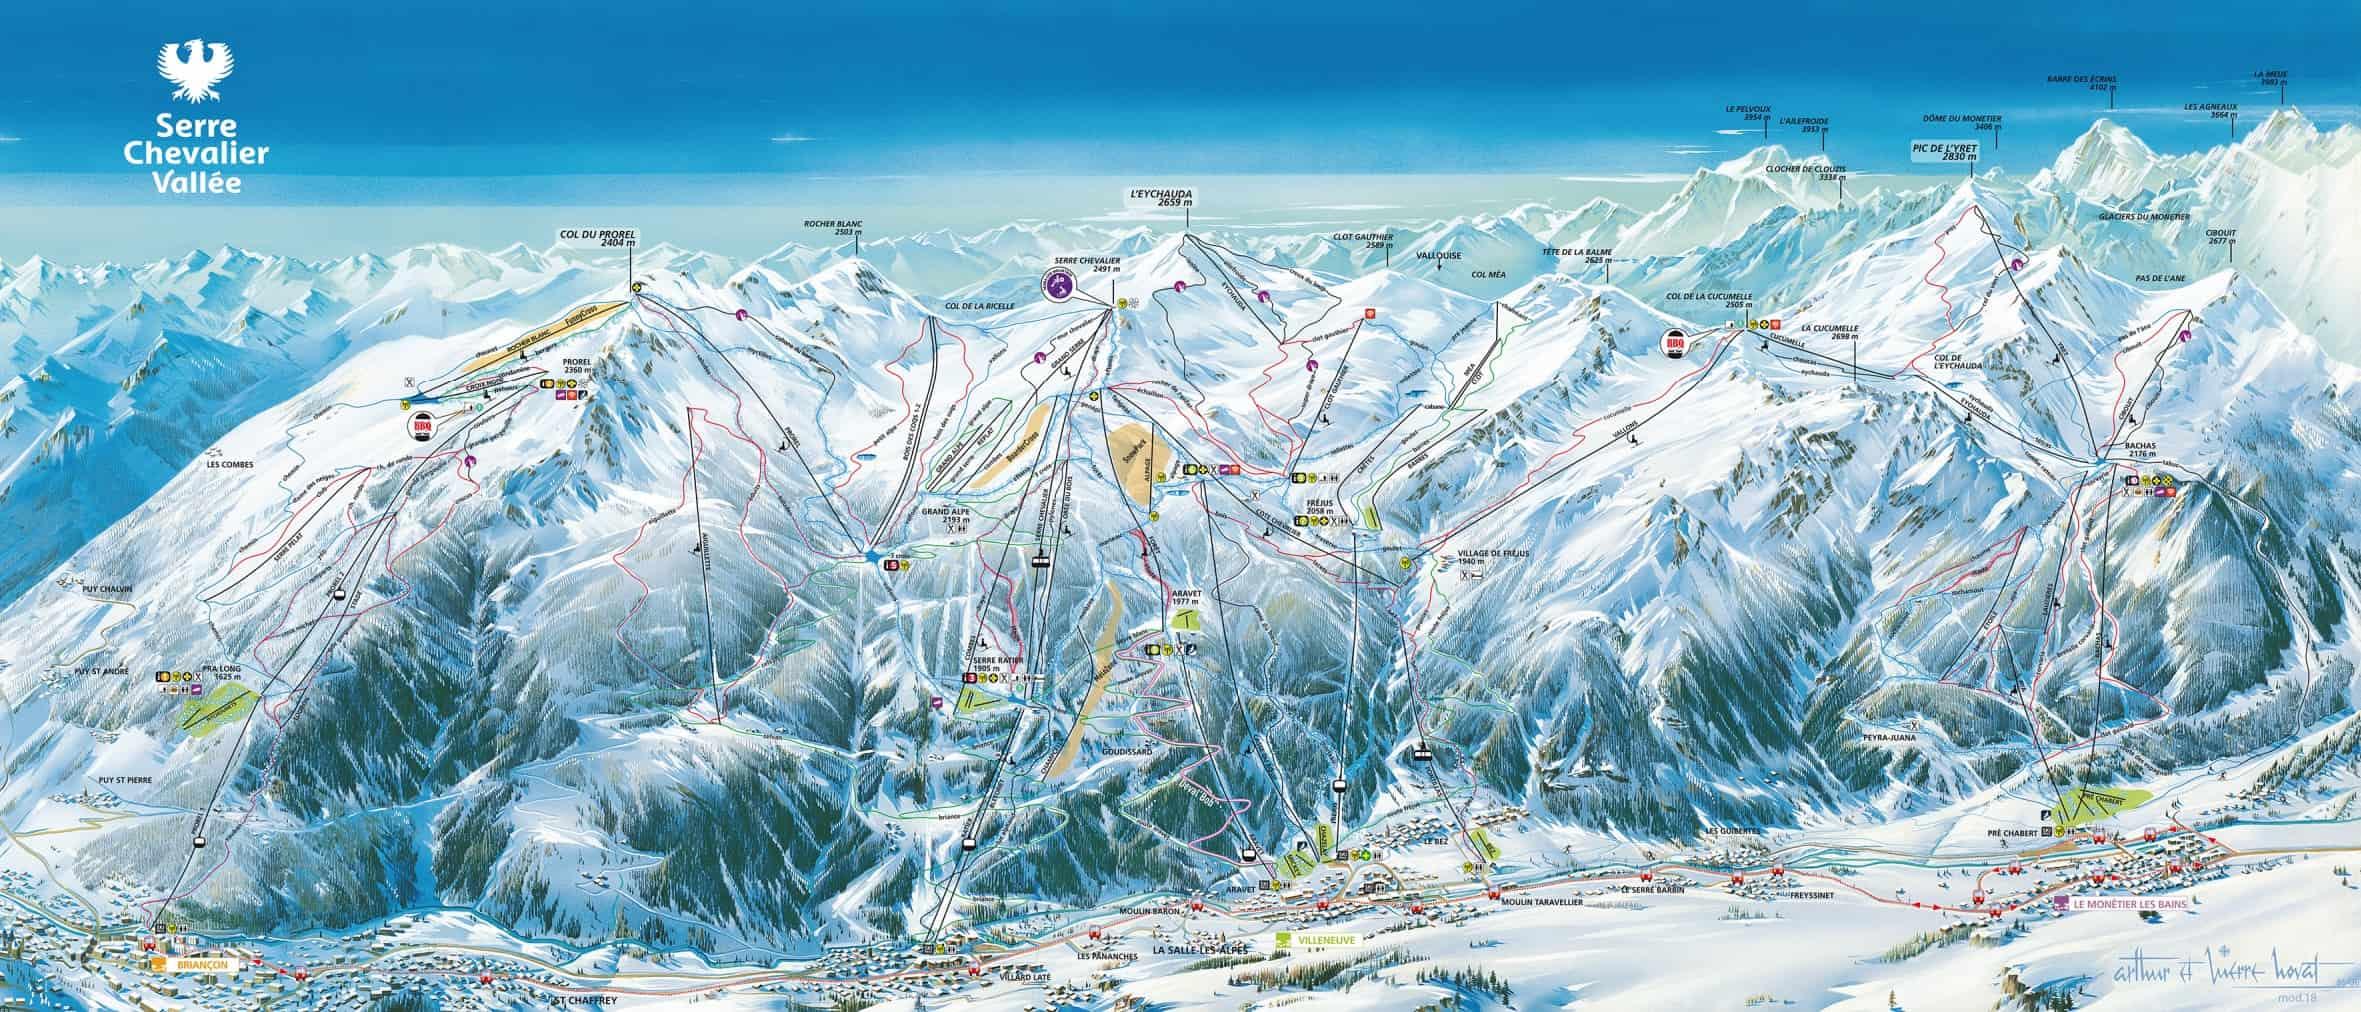 Serre Chevalier Ski JPG